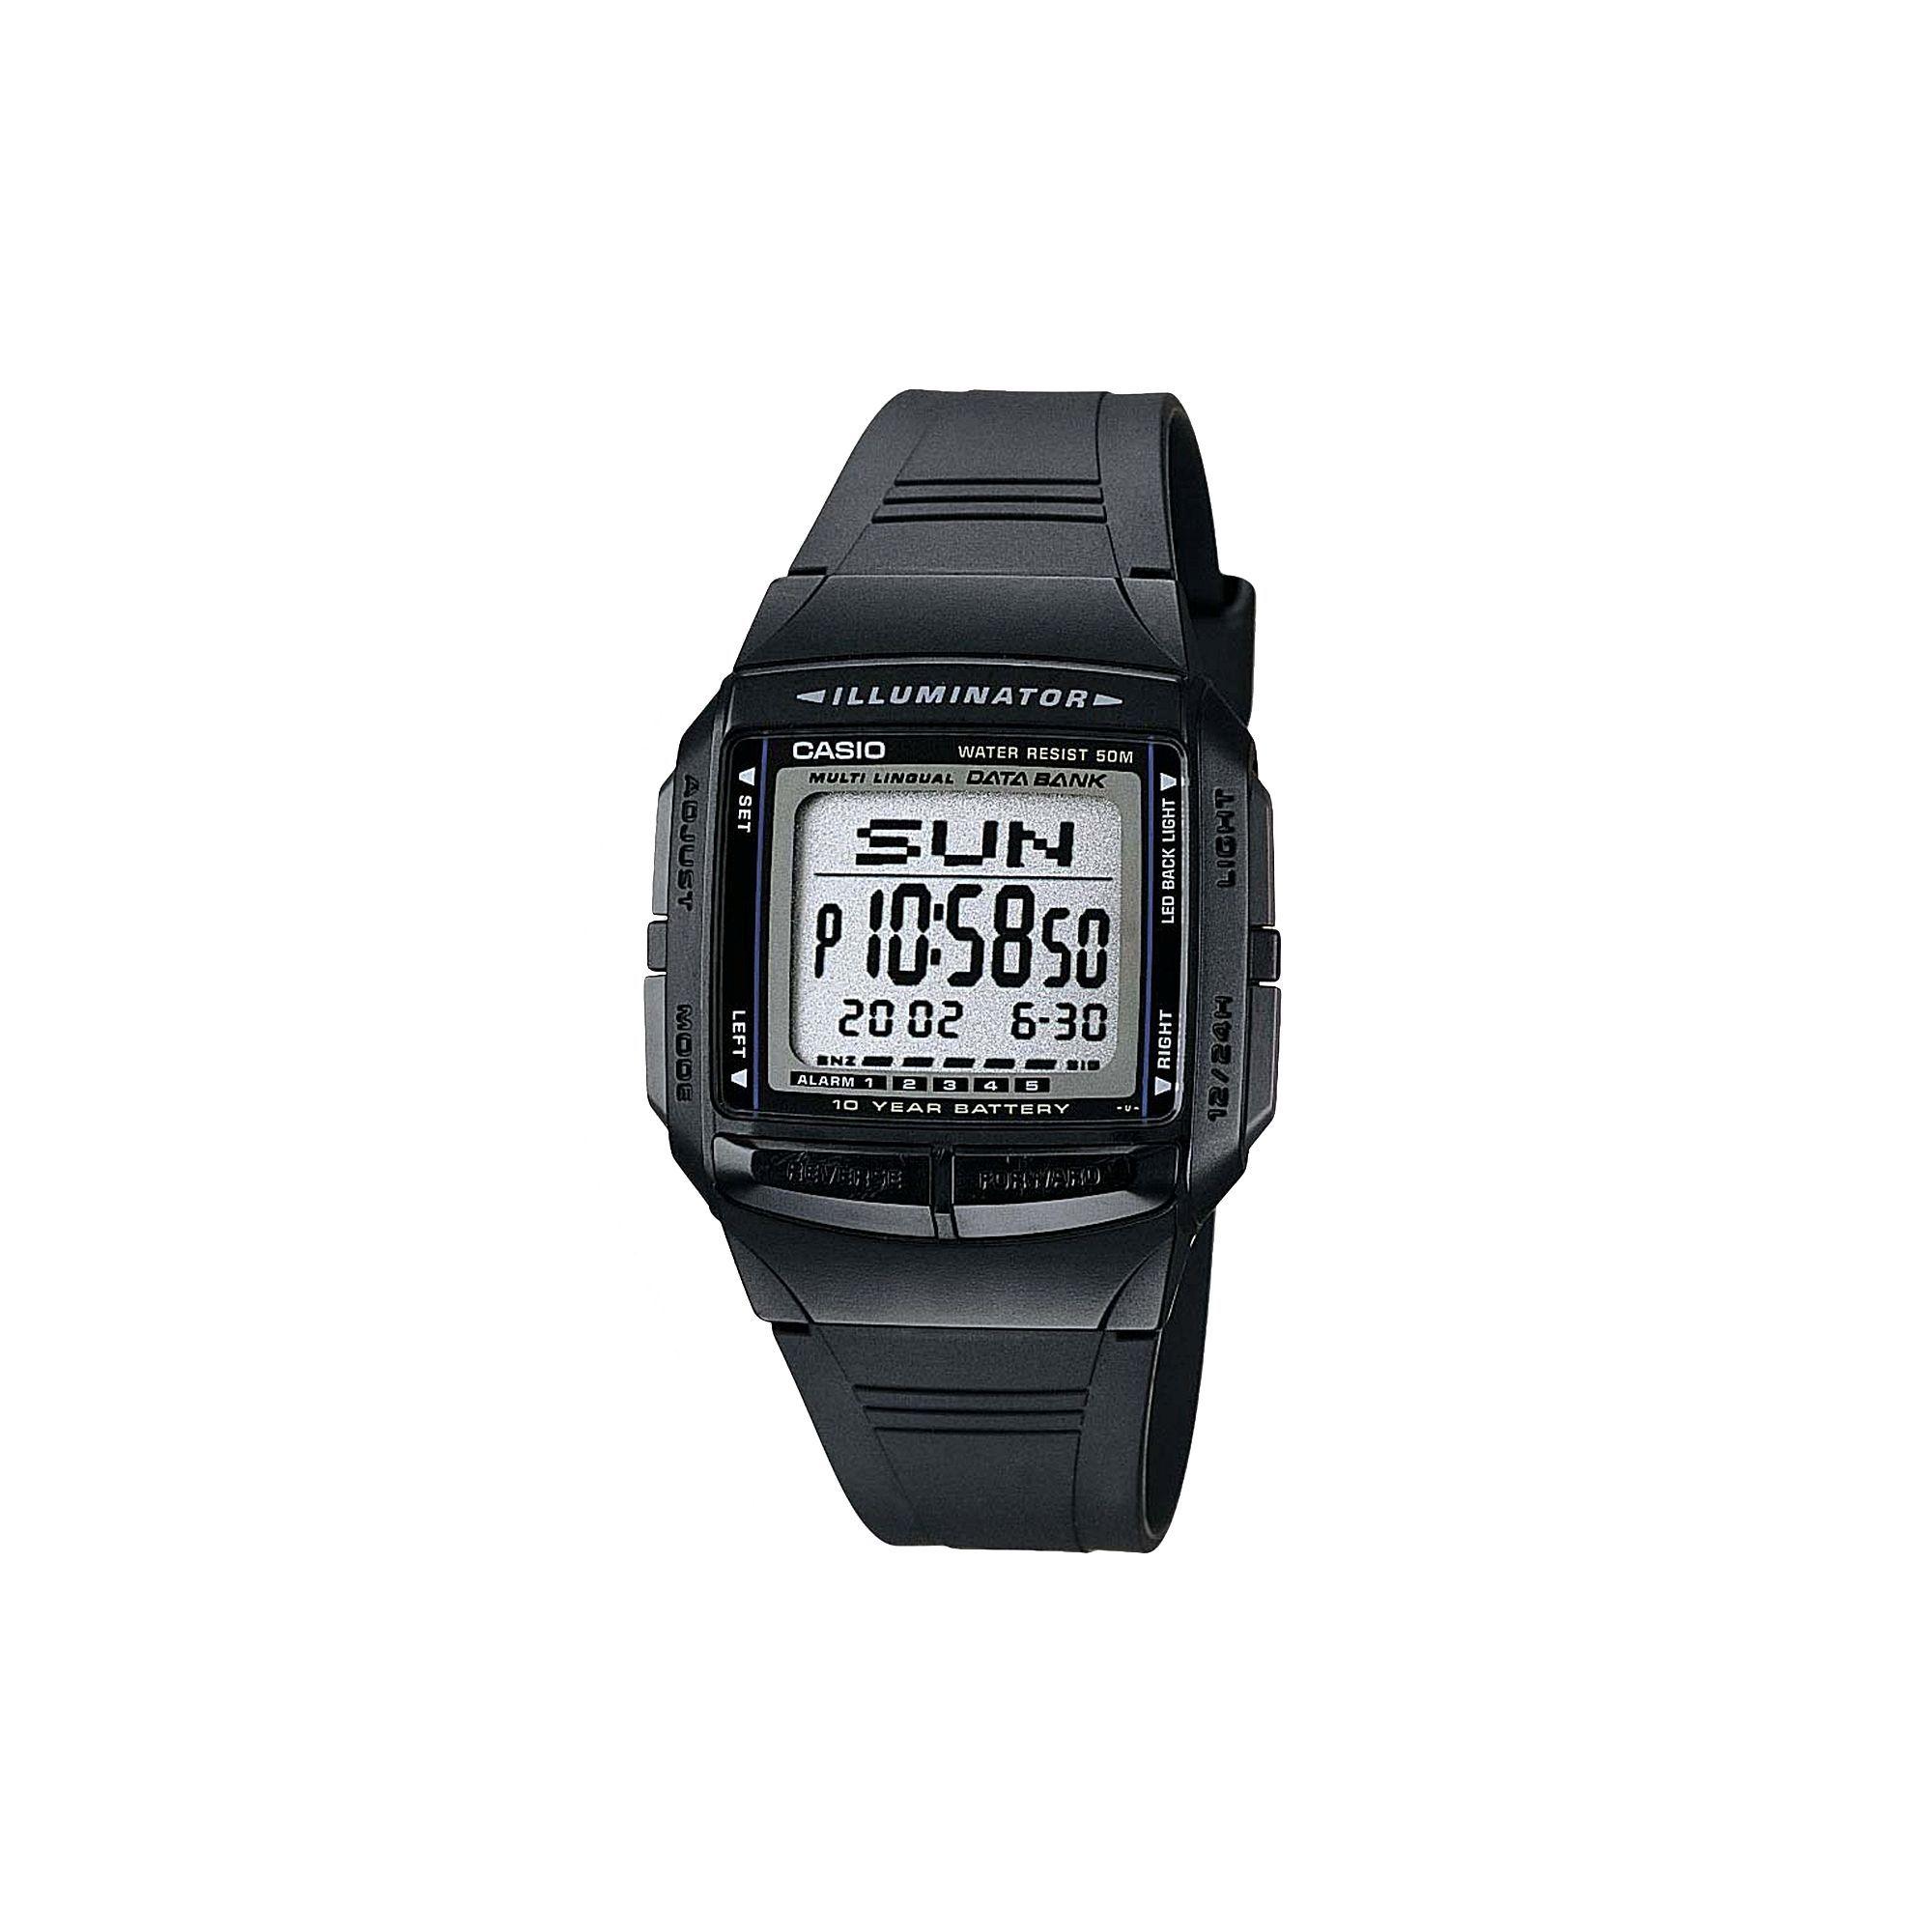 3a3cfca828e Casio Men s Illuminator Multilingual Digital Databank   Chronograph Watch -  DB36-1AV